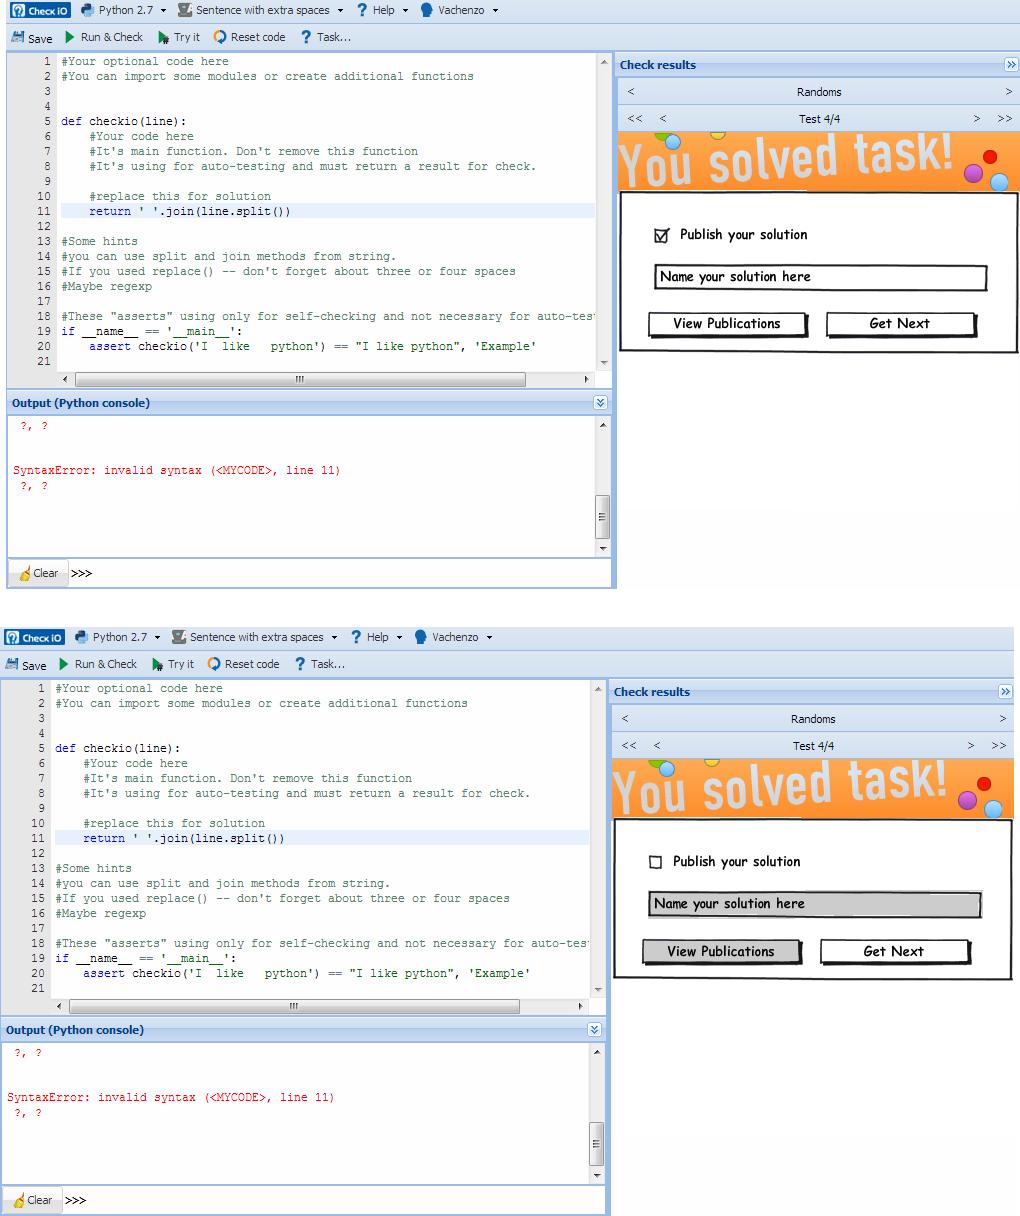 New win screen? - python coding challenges - Py CheckiO